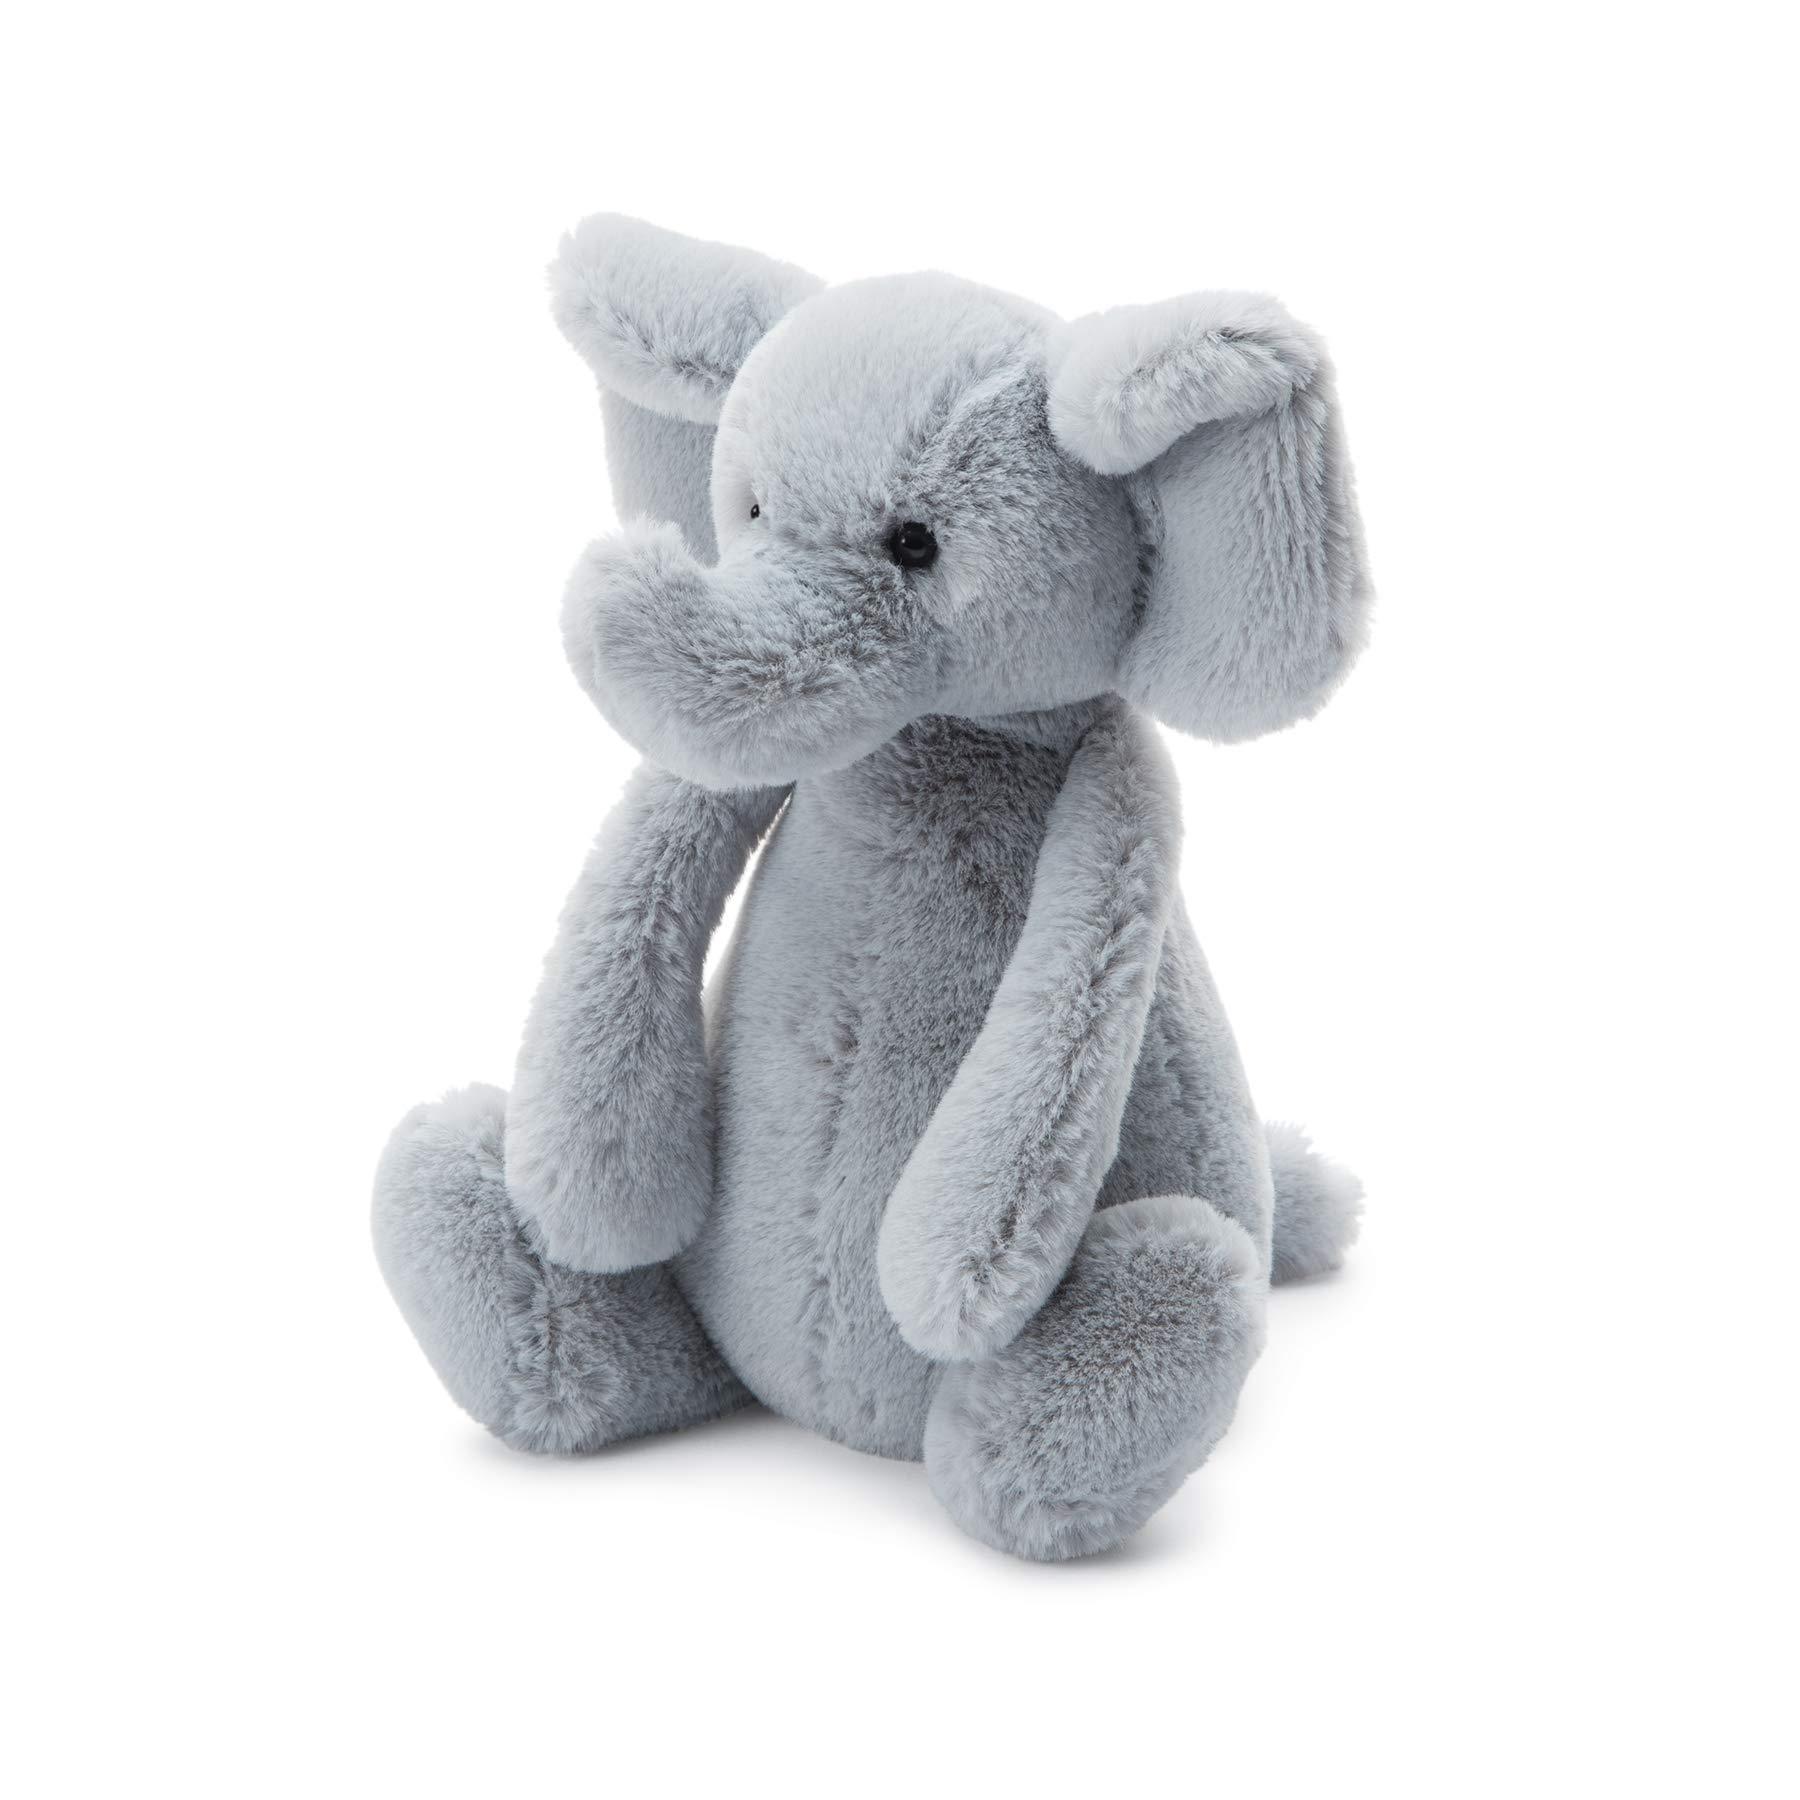 Jellycat Bashful Grey Elephant Stuffed Animal, Large, 15 inches by Jellycat